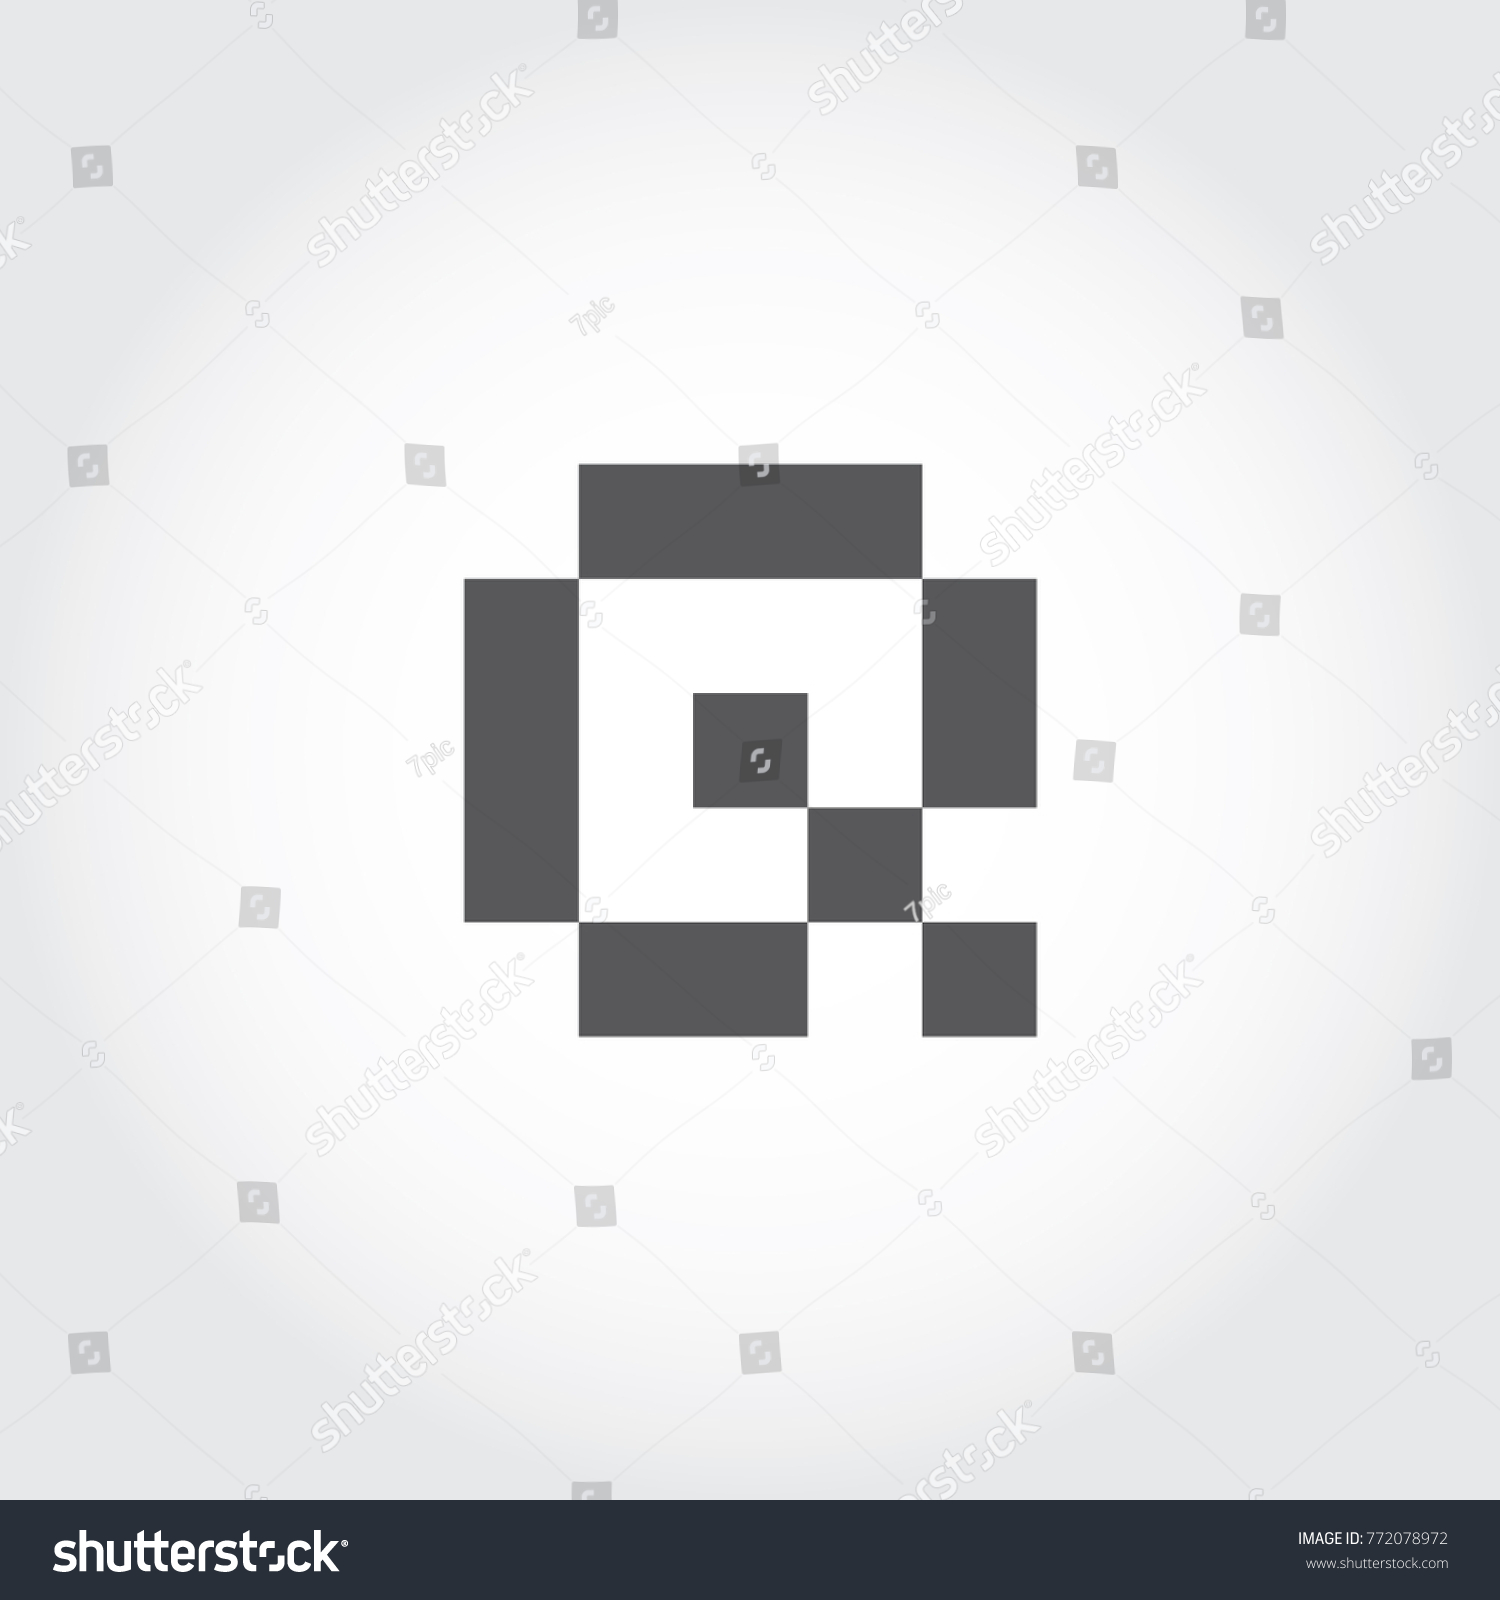 Pixel Font Digital Font Logo Icon Stock Photo Photo Vector